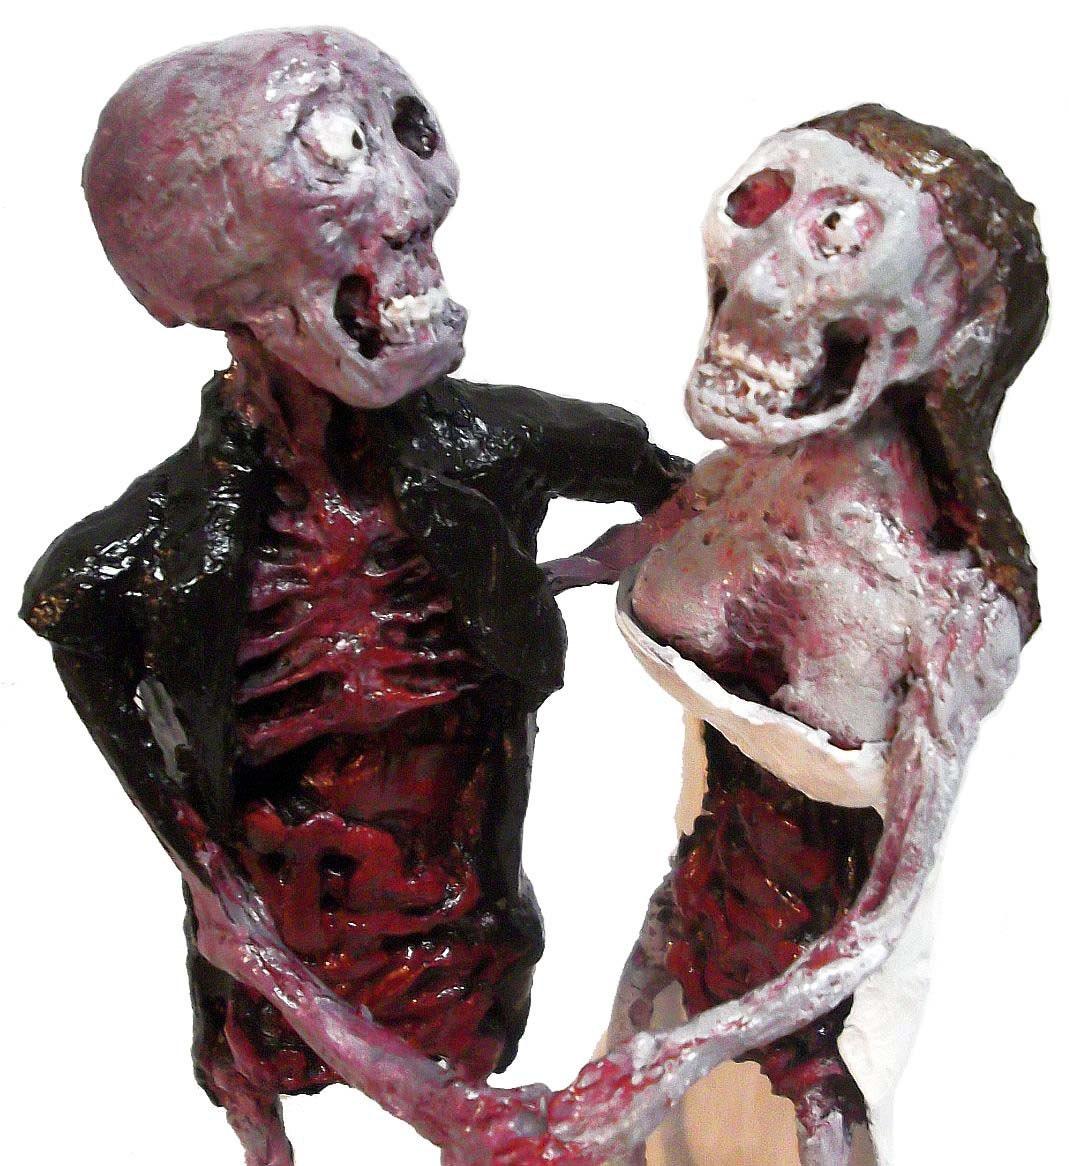 Zombie Bride & Groom Wedding Cake Topper Sculpture Statue